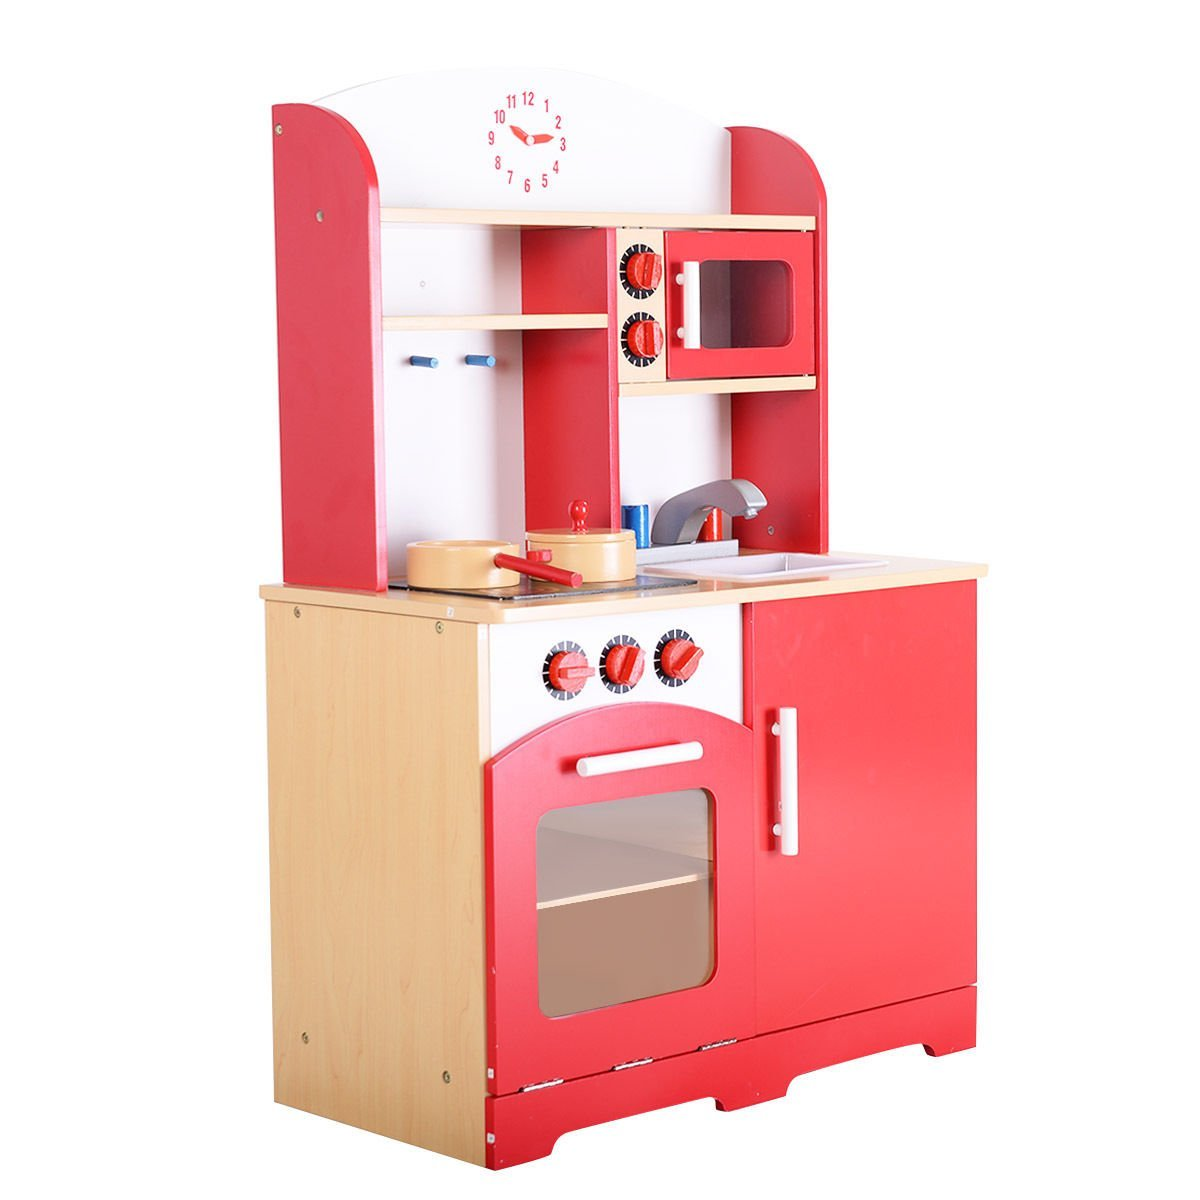 New Goplus Wood Kitchen Toy Kids Cooking Pretend Play Set Toddler